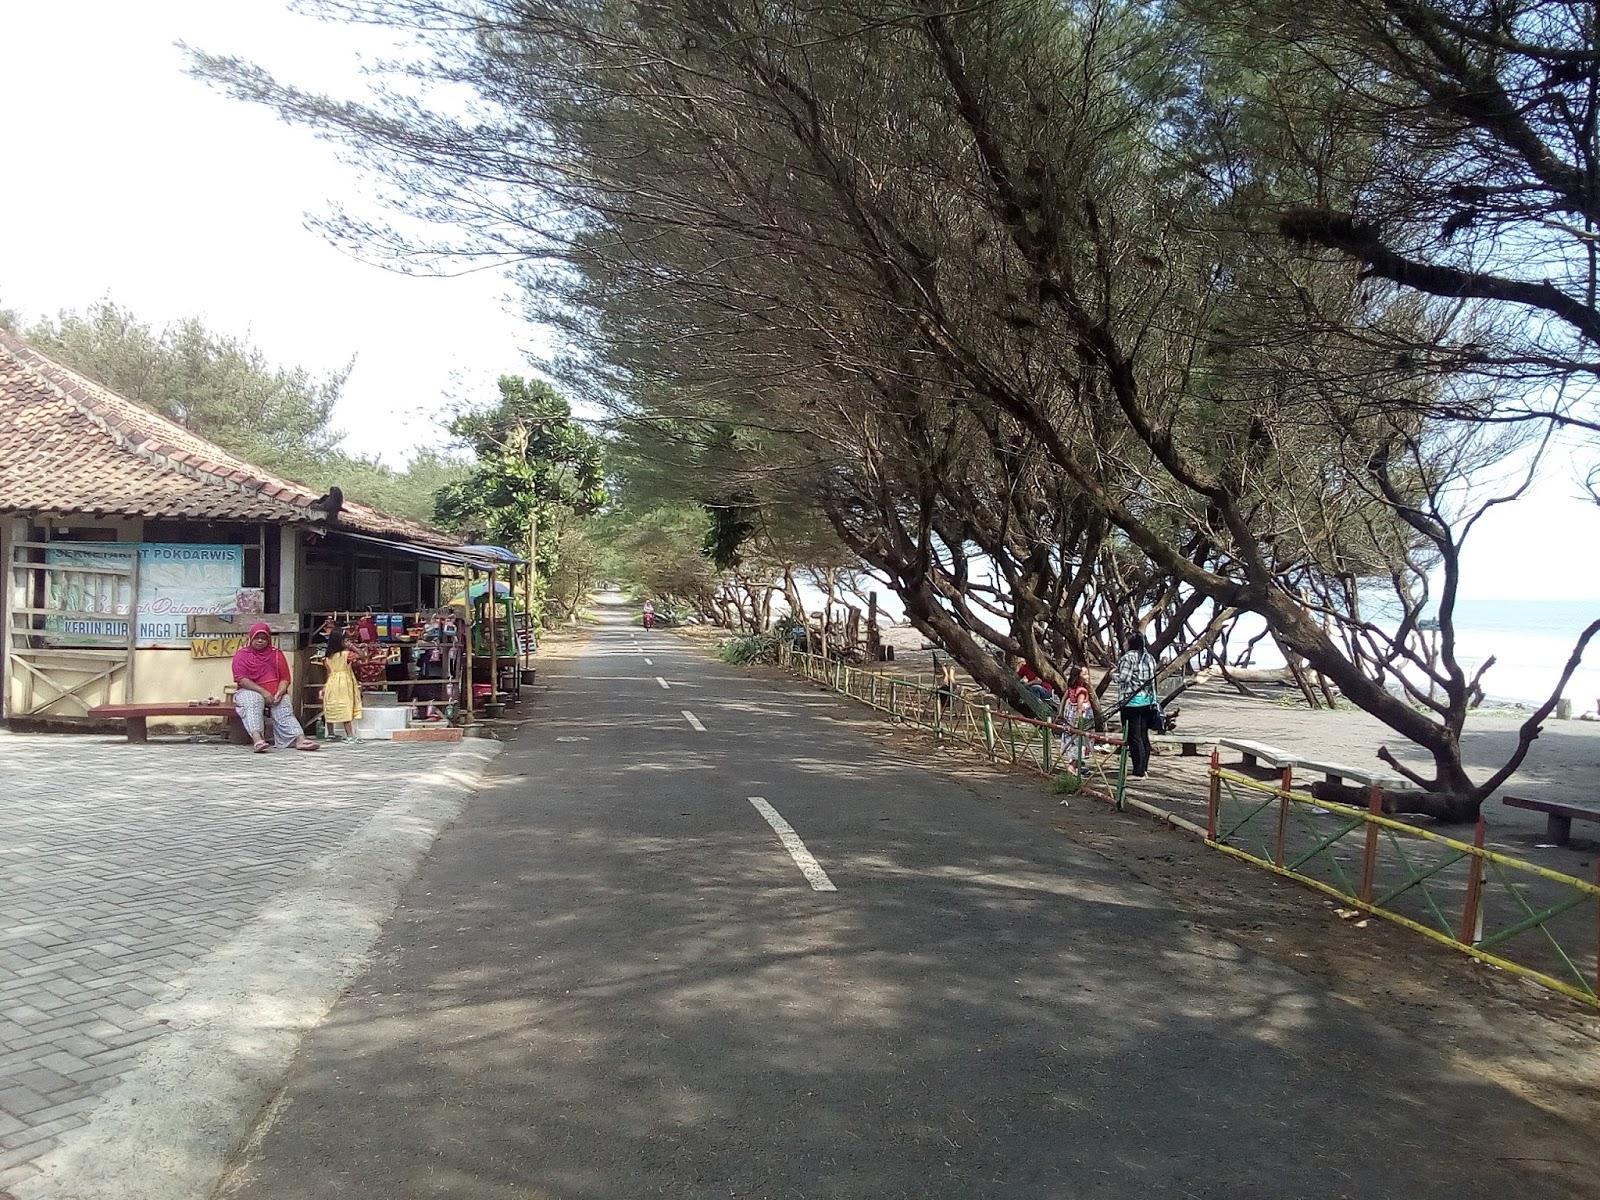 Wisata Pantai Bantul Pantai Pandansari Paket Wisata Pantai